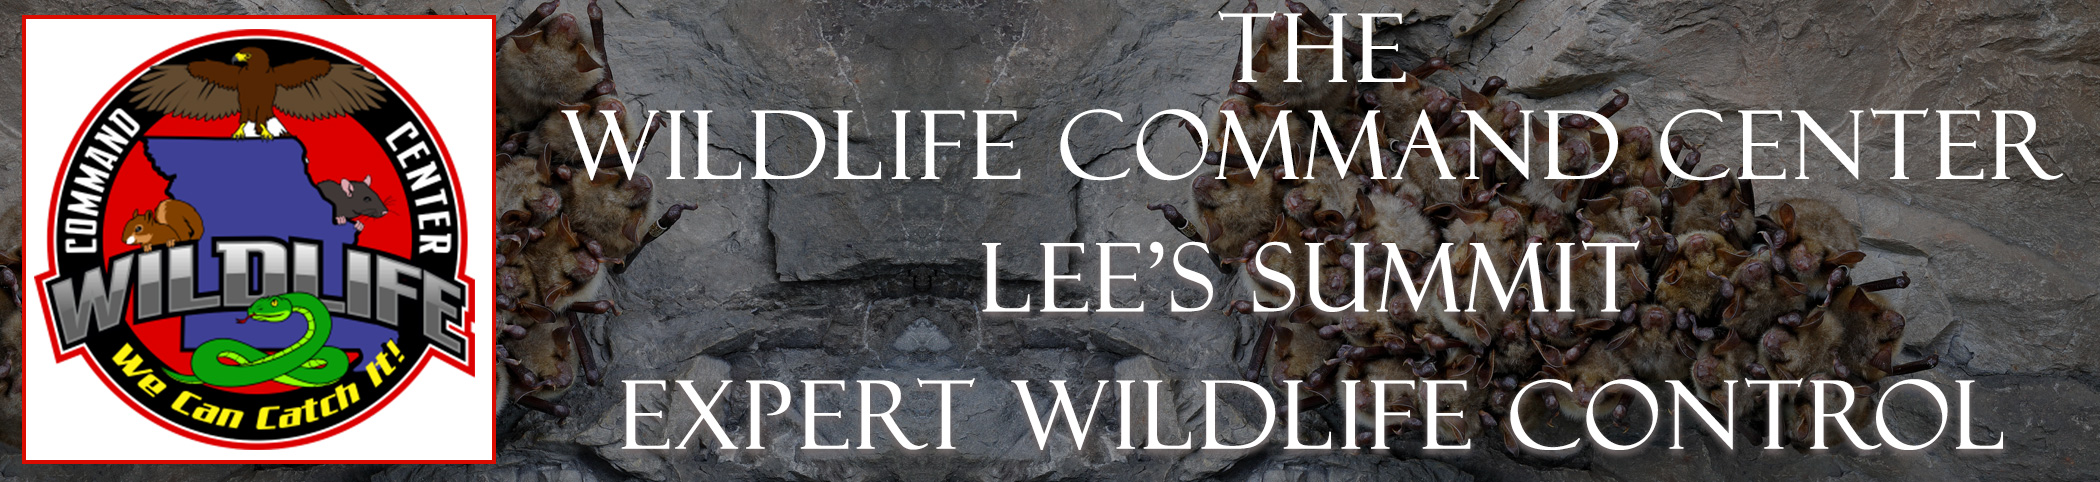 The Wildlife Command Center Lee's Summit Missouri Image